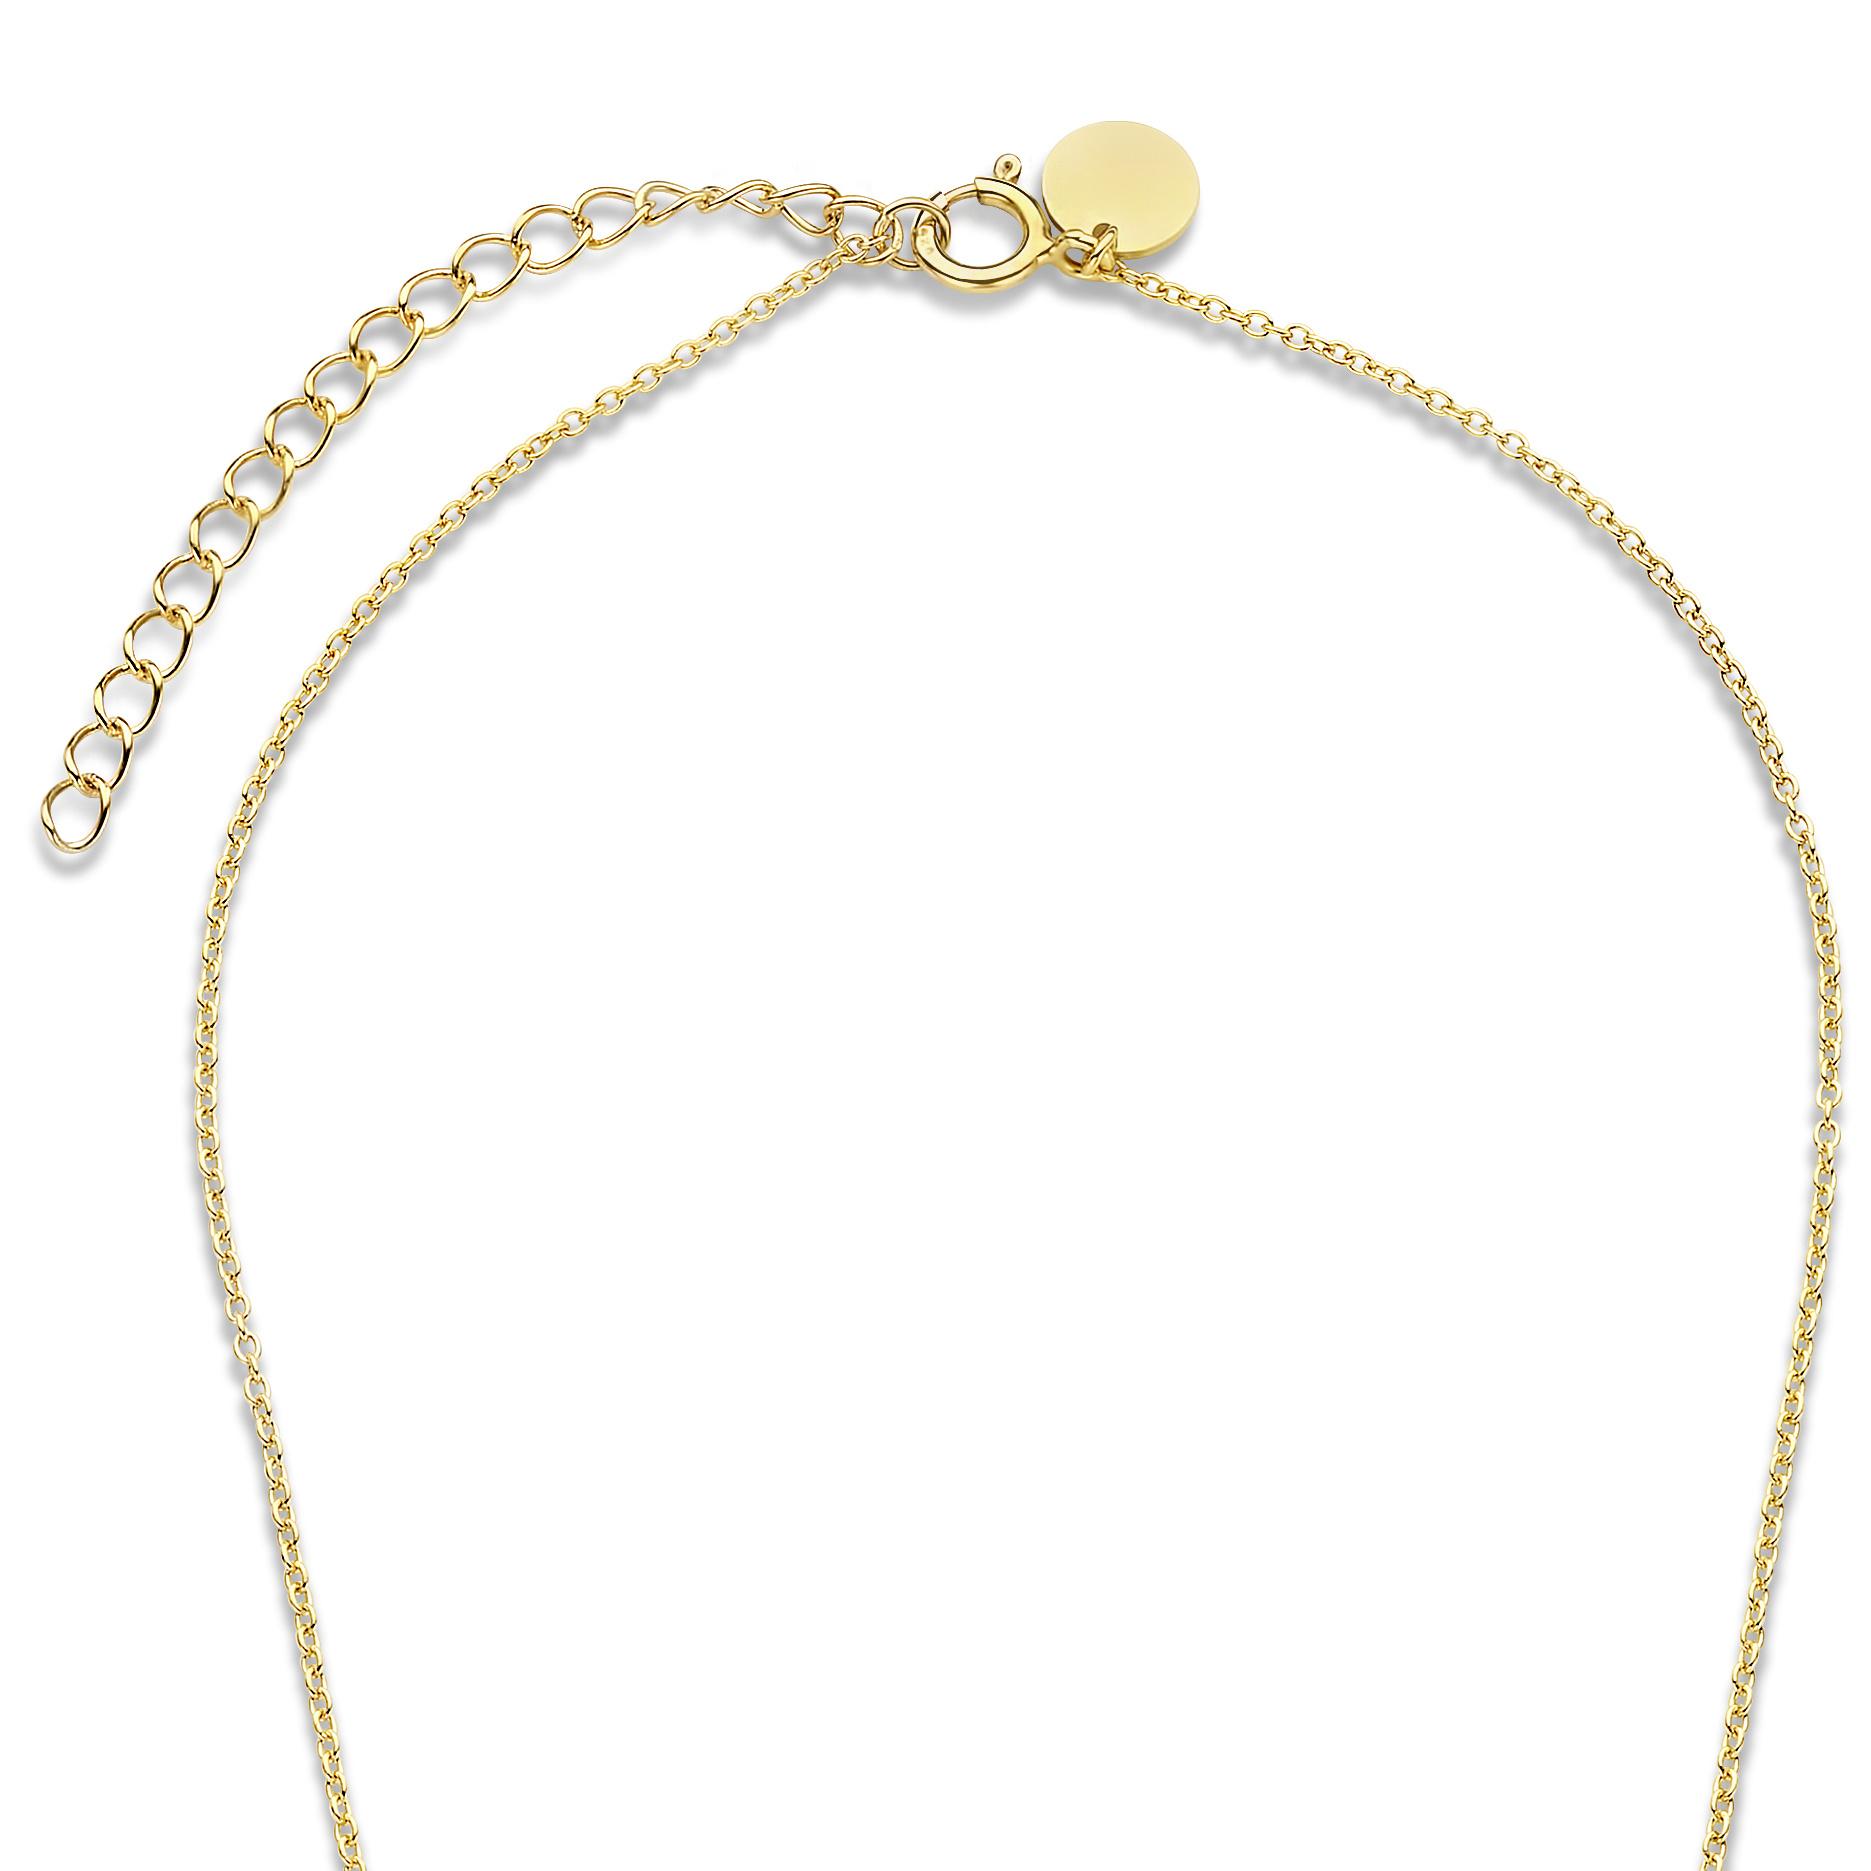 Violet Hamden Luminous Lake 925 sterlingsølv guldfarvet halskæde med ferskvandsperler